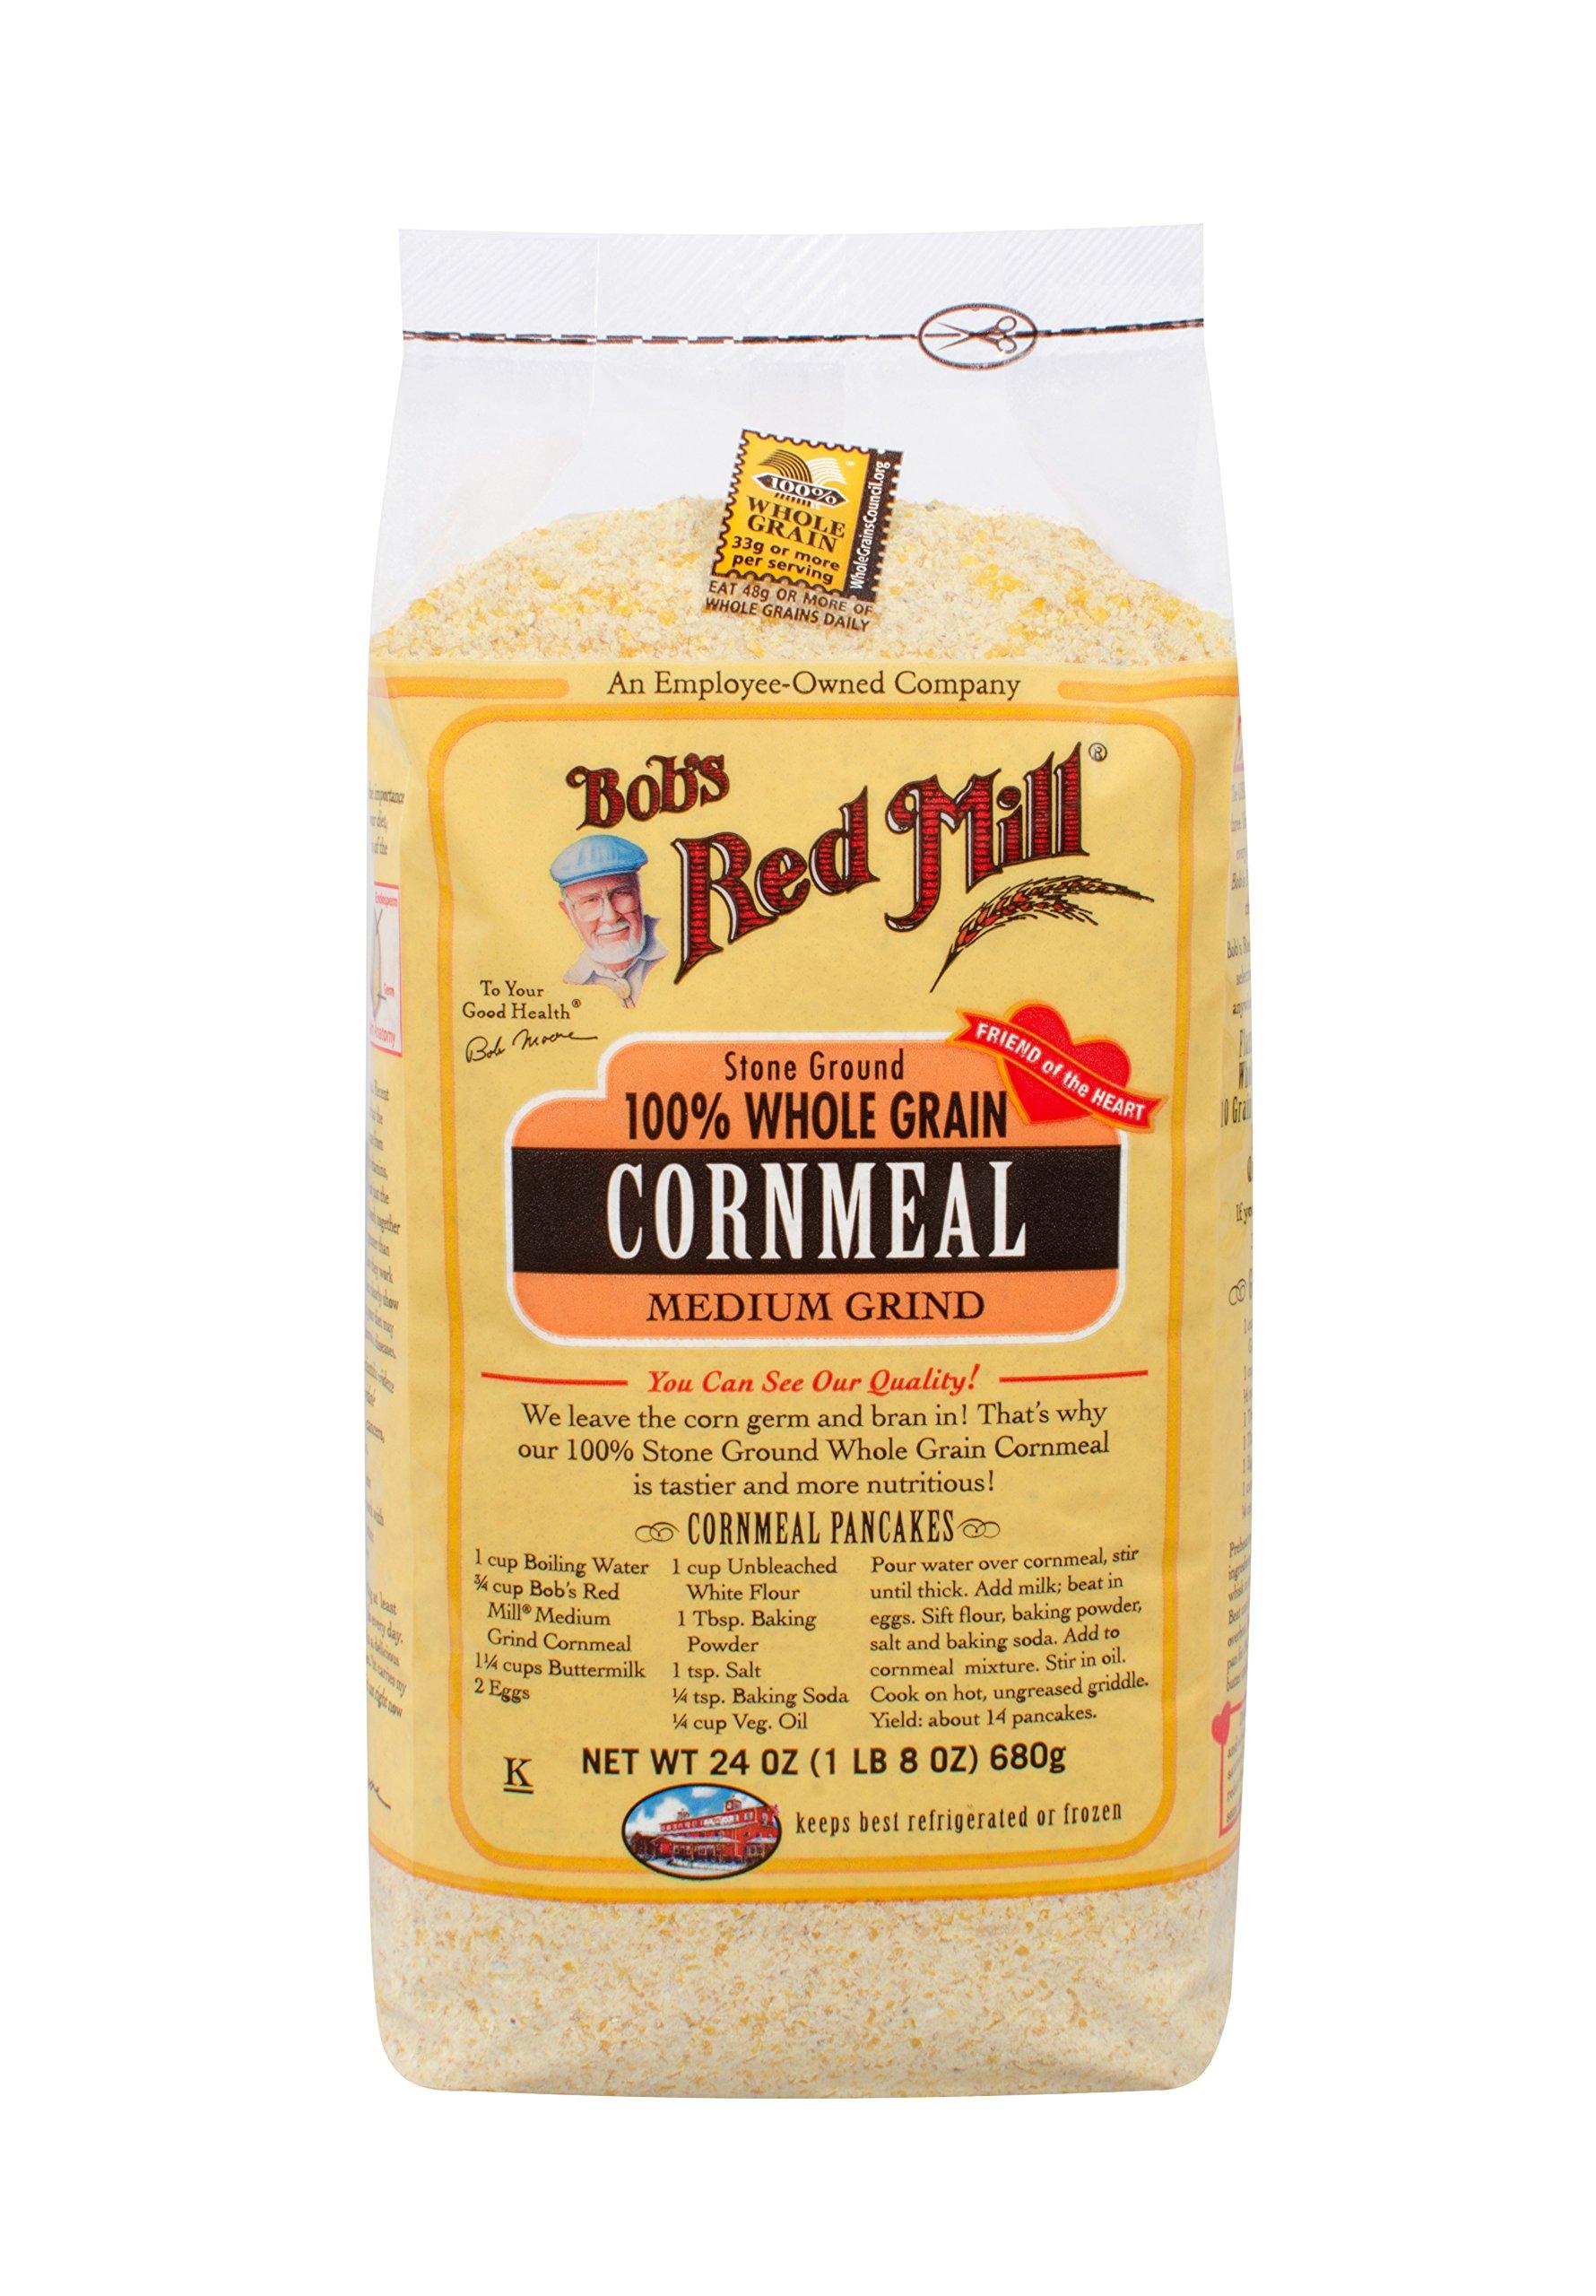 Cornmeal Medium Grind